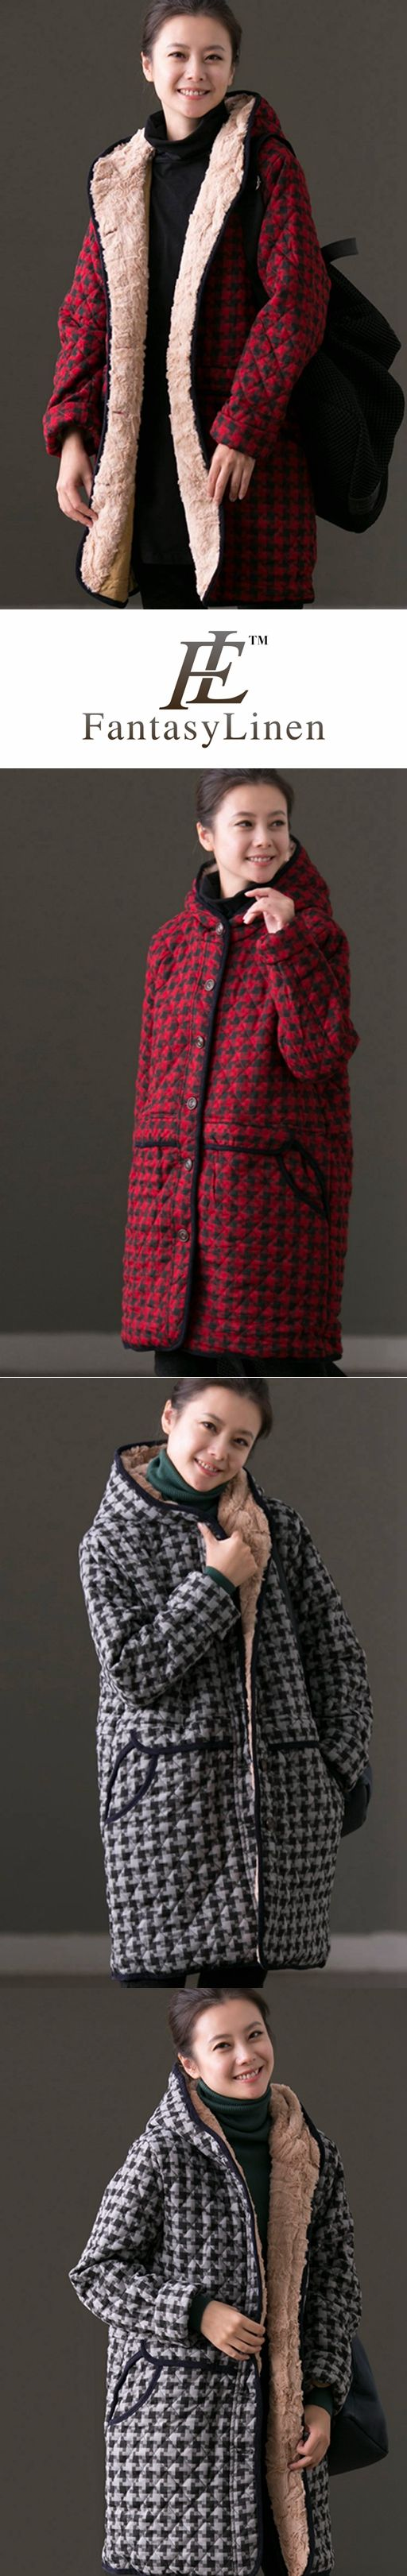 RED GRID HOODIE WARM WINTER COAT FOR WOMEN W6323B